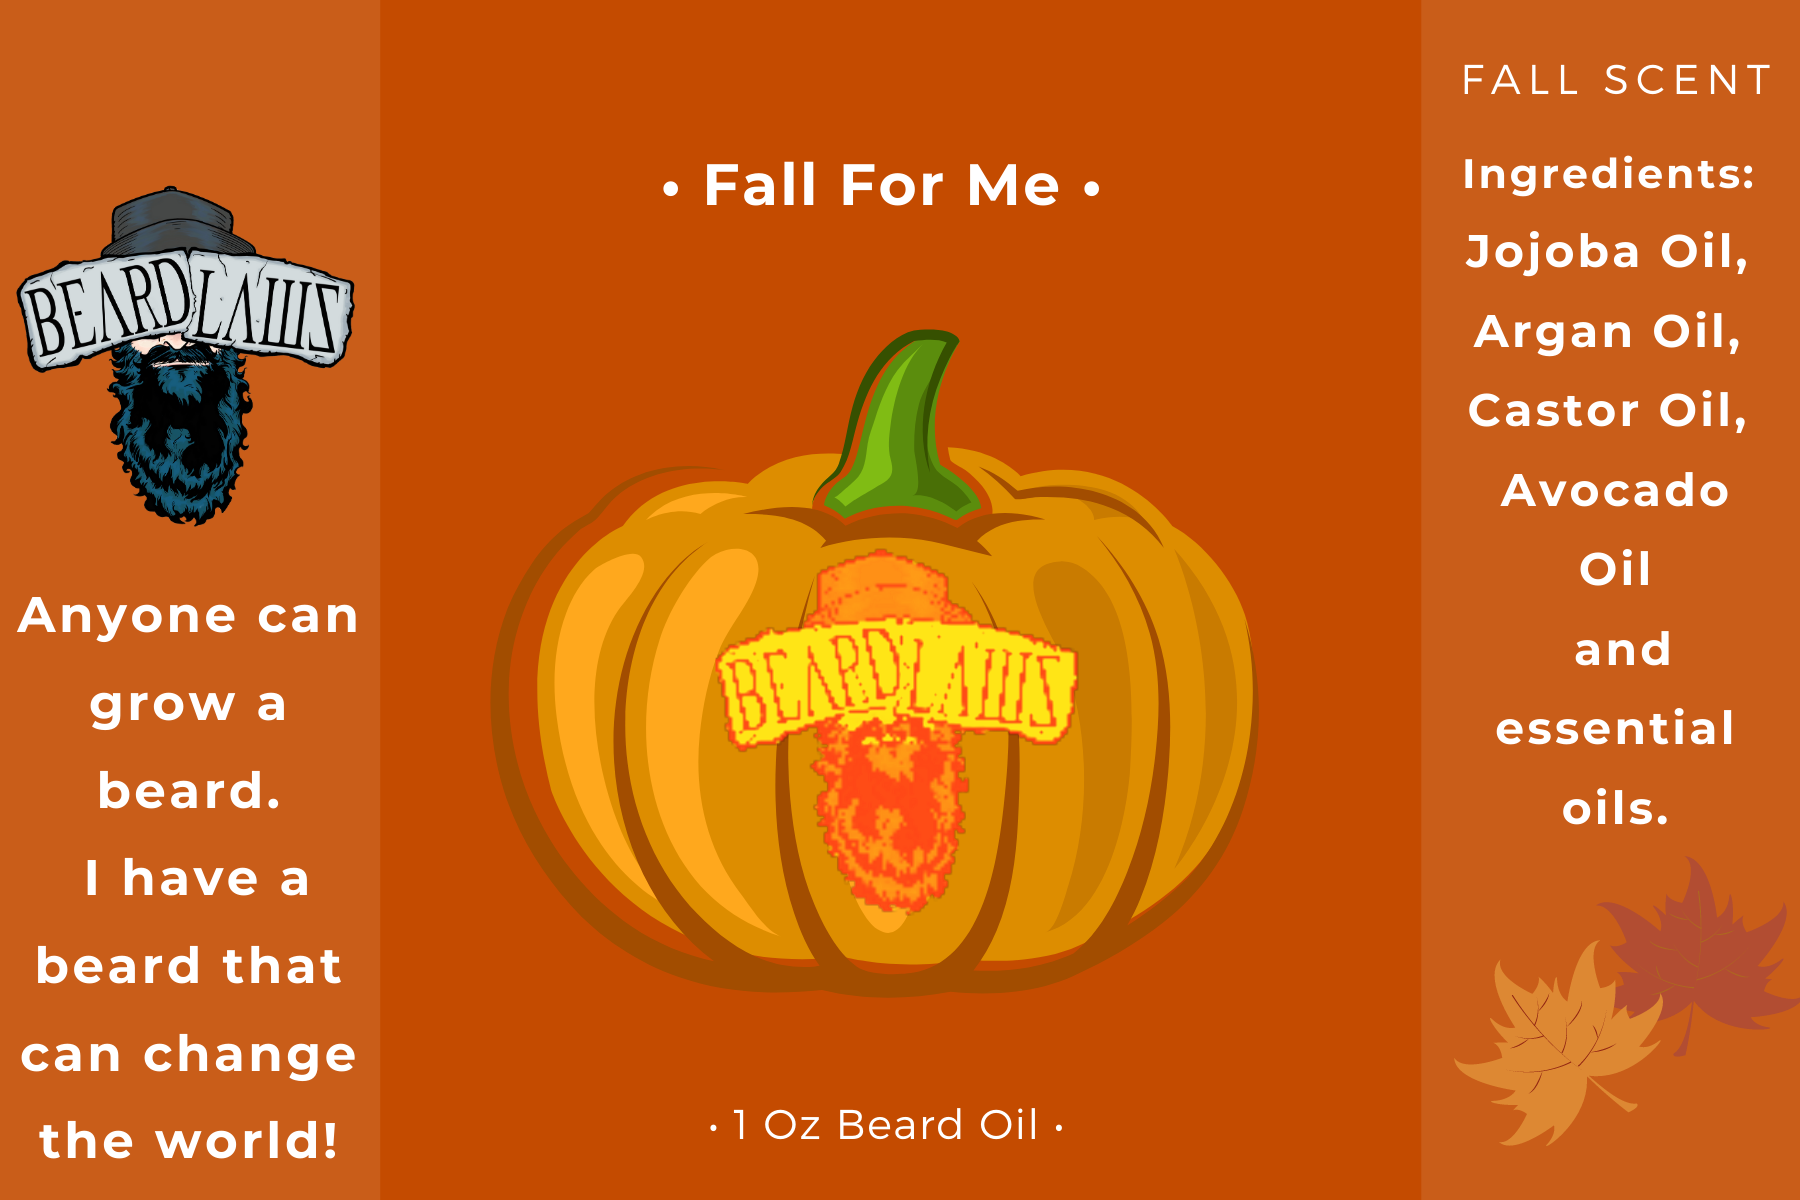 Beard Laws Beard Oil - Fall For Me